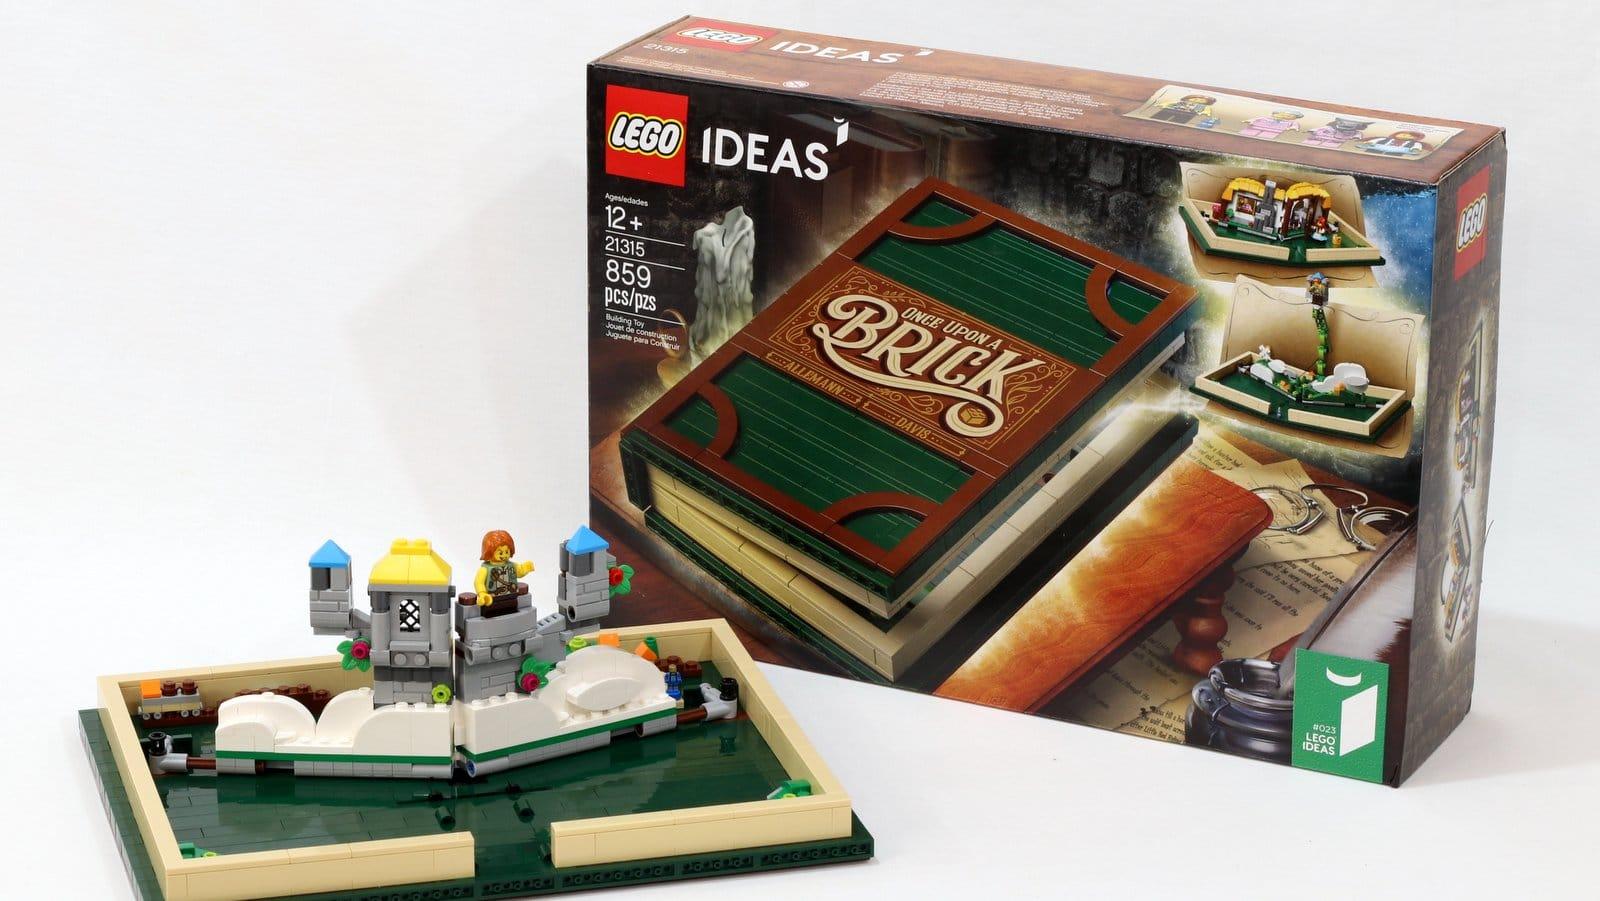 LEGO Once Upon A Brick: Das erste Pop-Up-Buch aus Bauklötzen